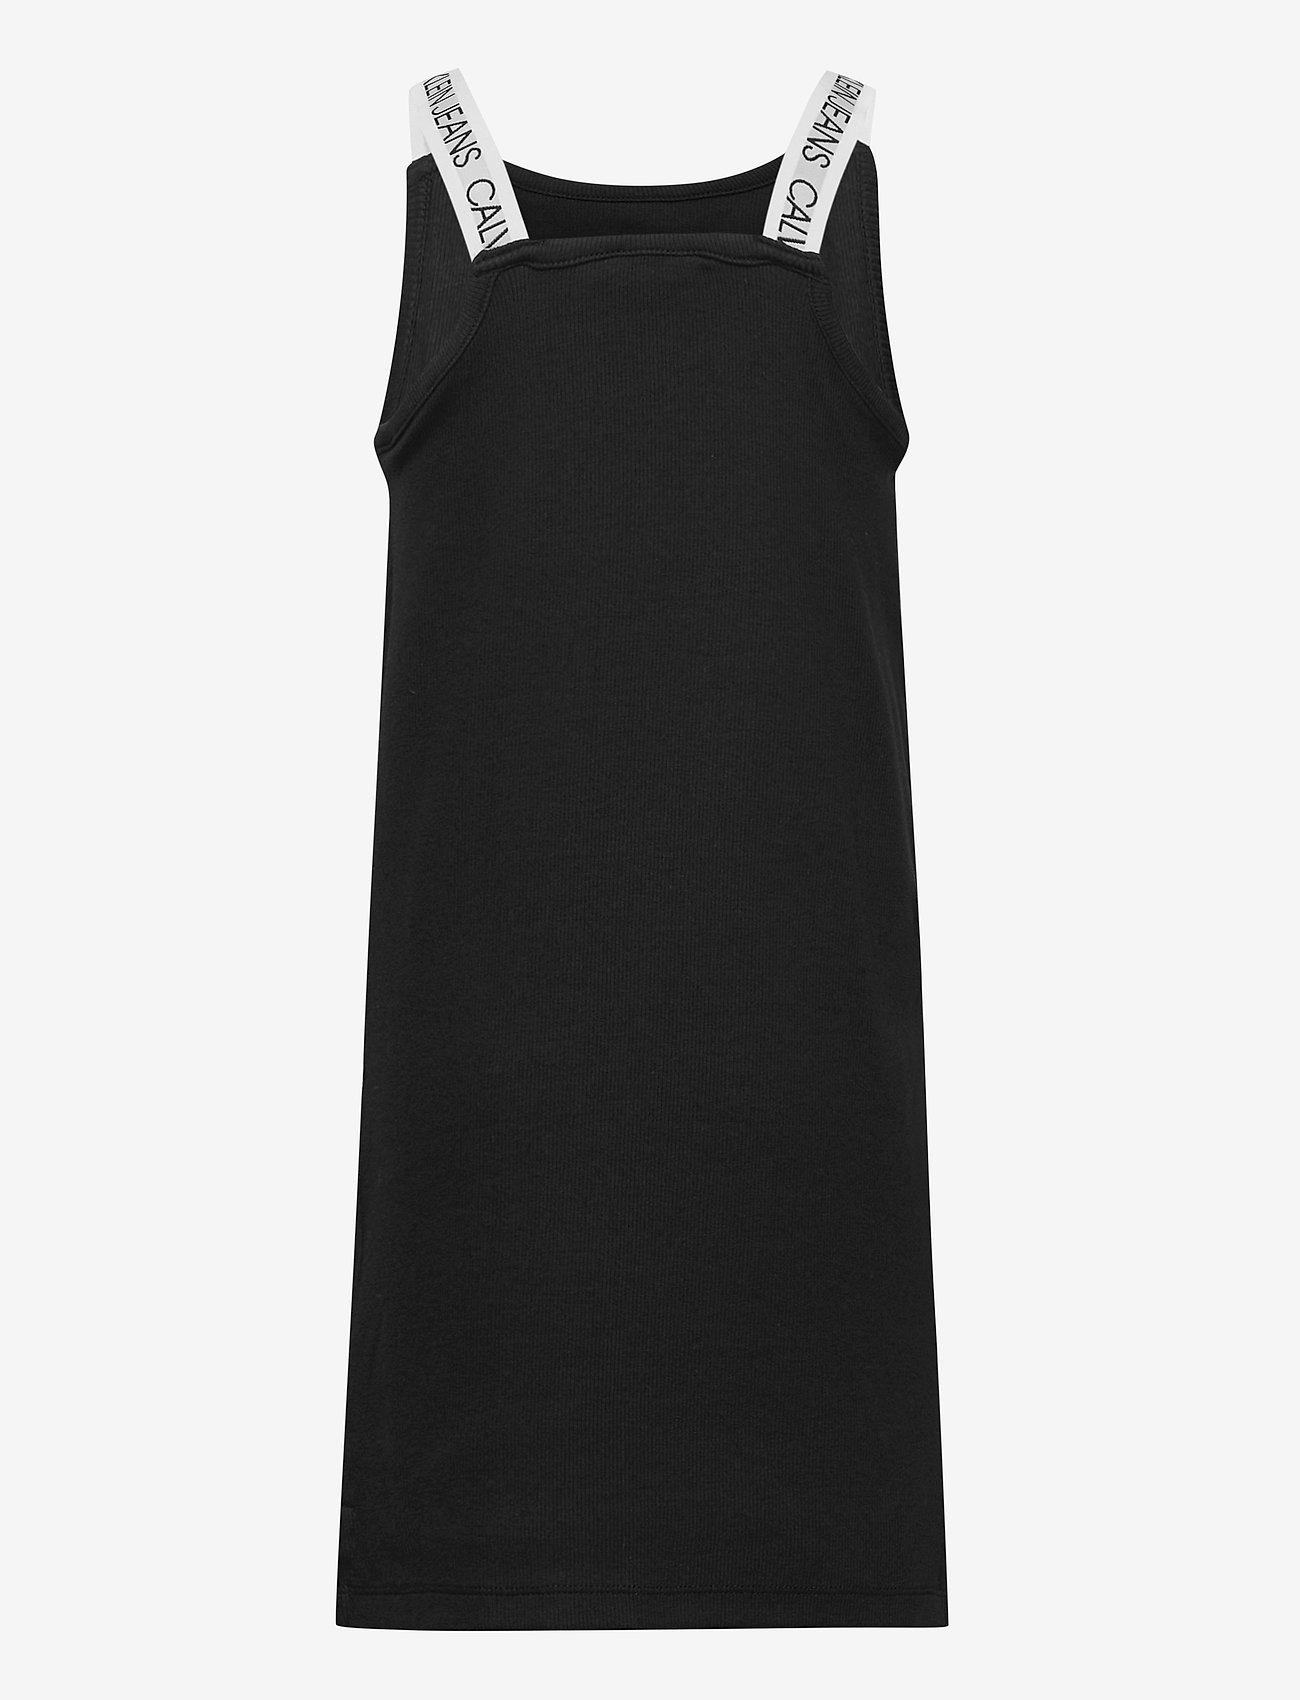 Calvin Klein - LOGO TAPE RIB STRAP DRESS - kleider - ck black - 1